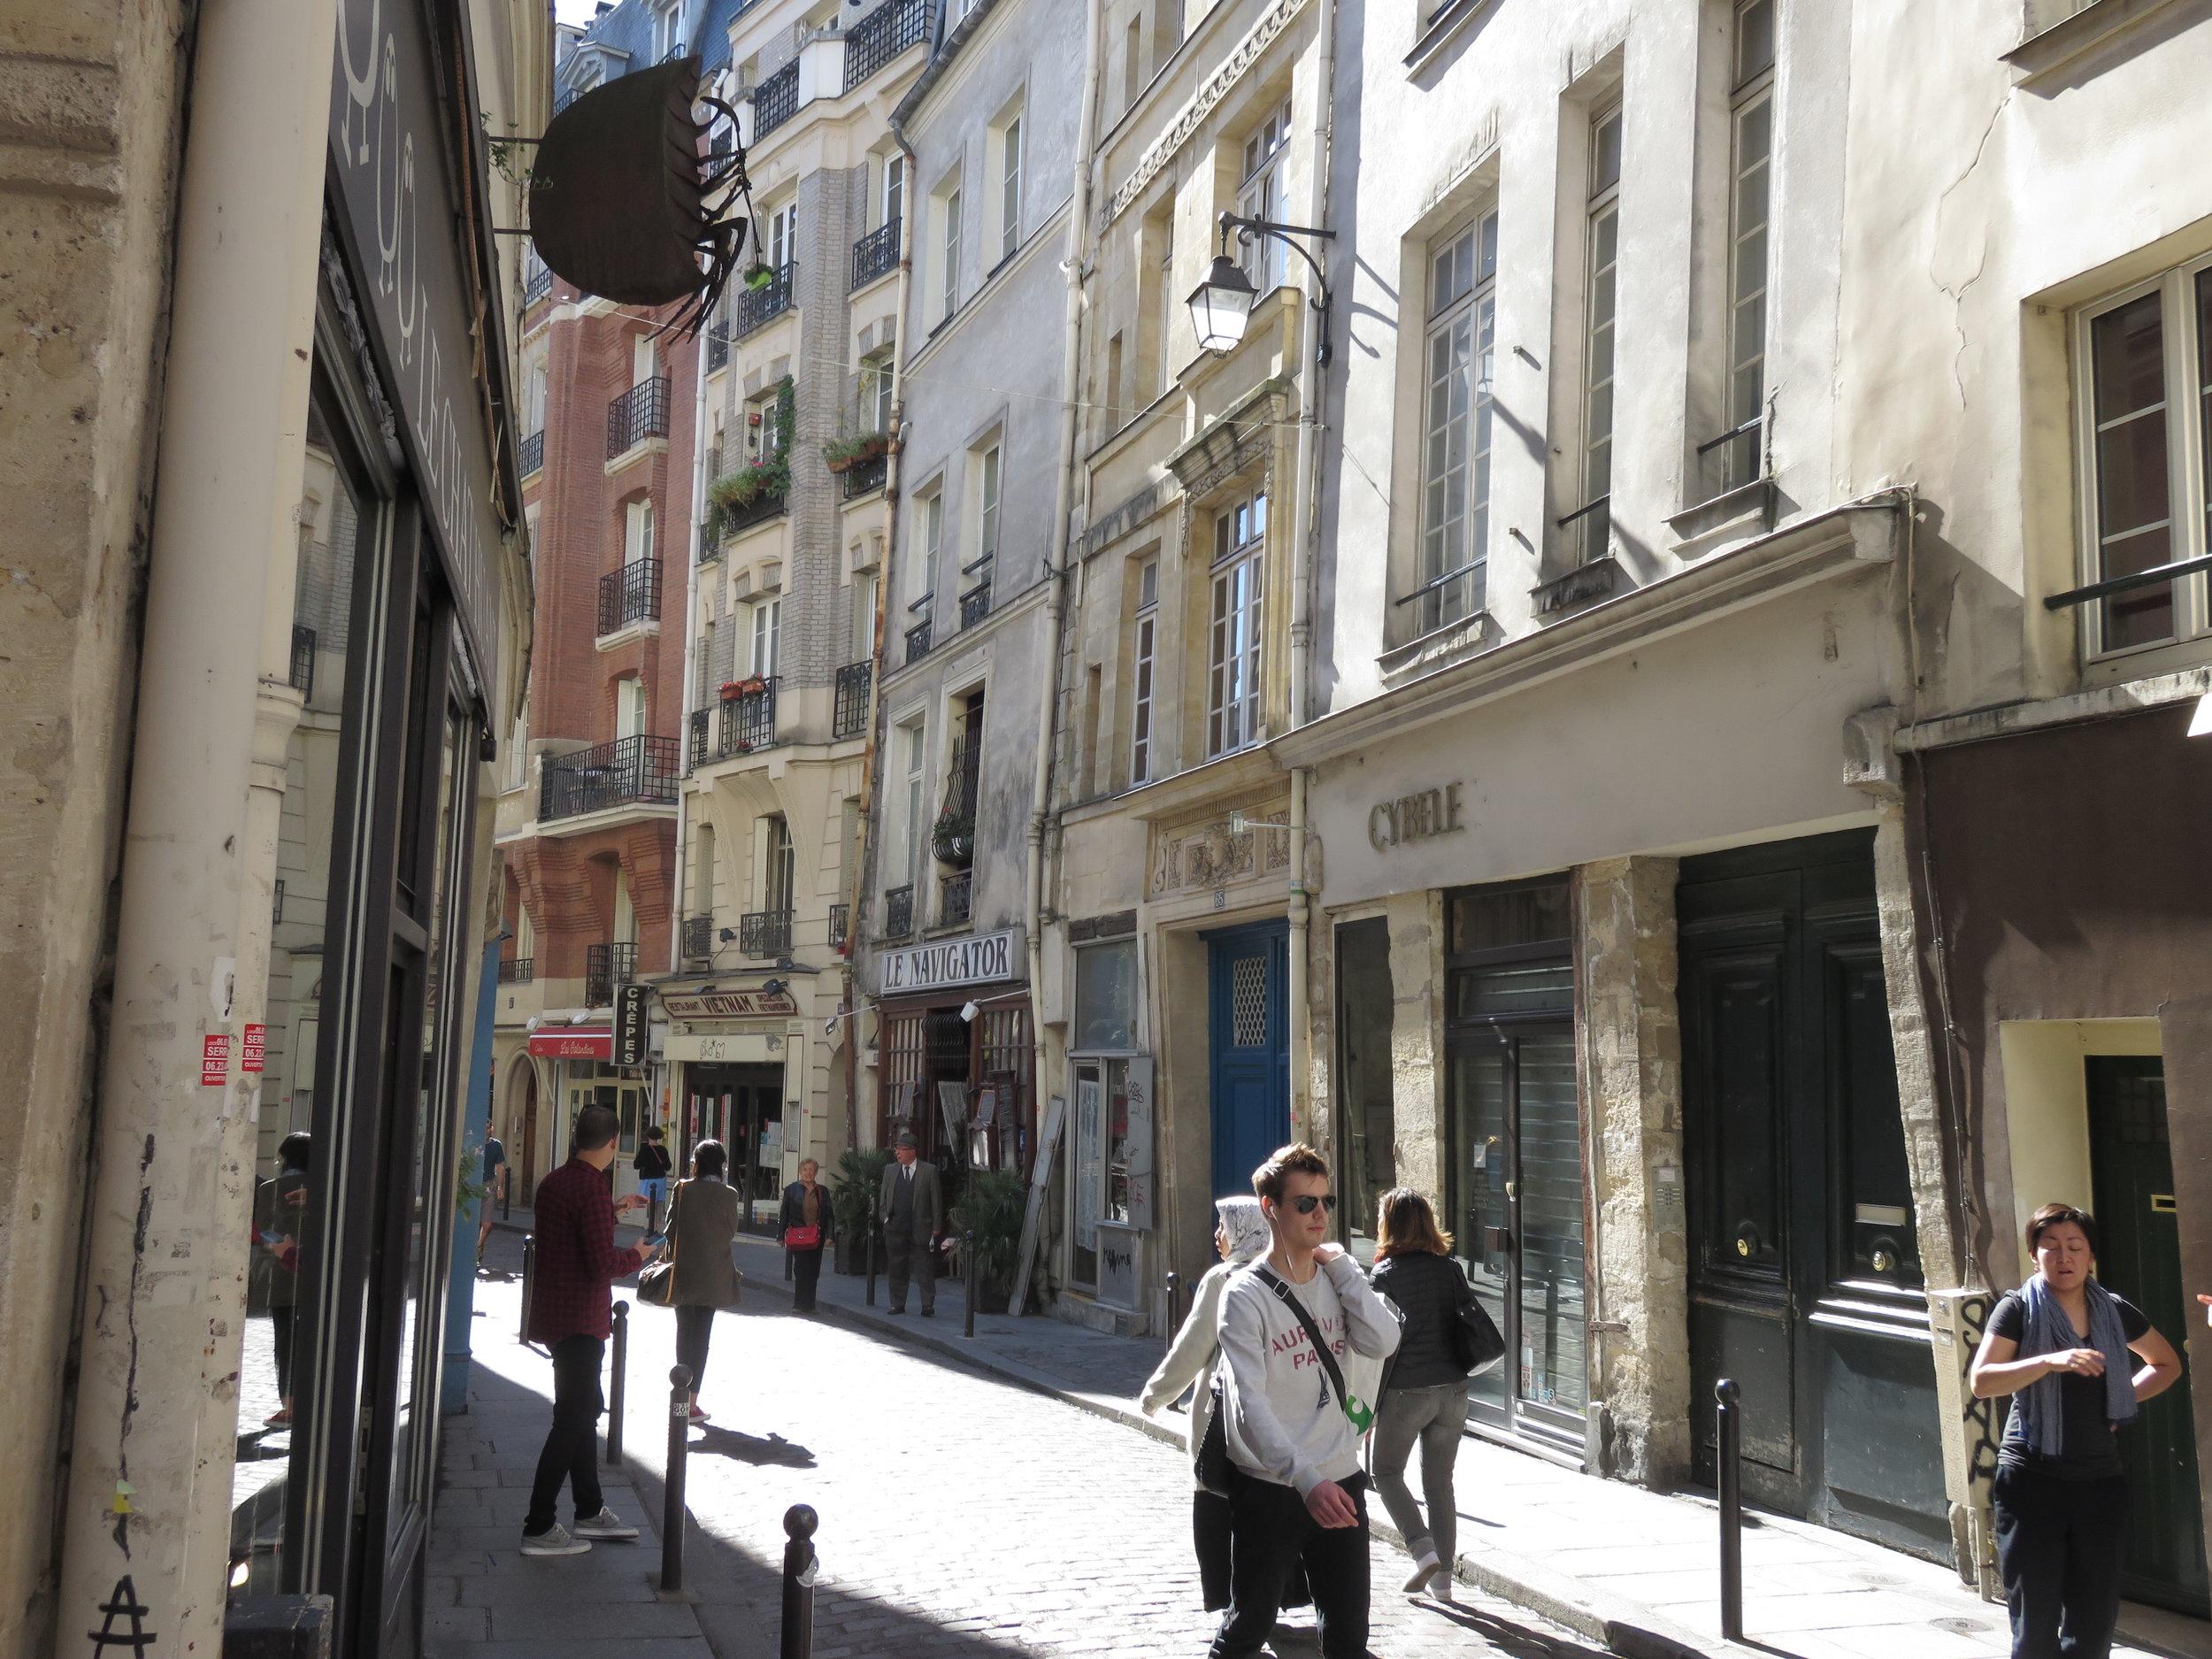 A typical Parisian neighborhood side street